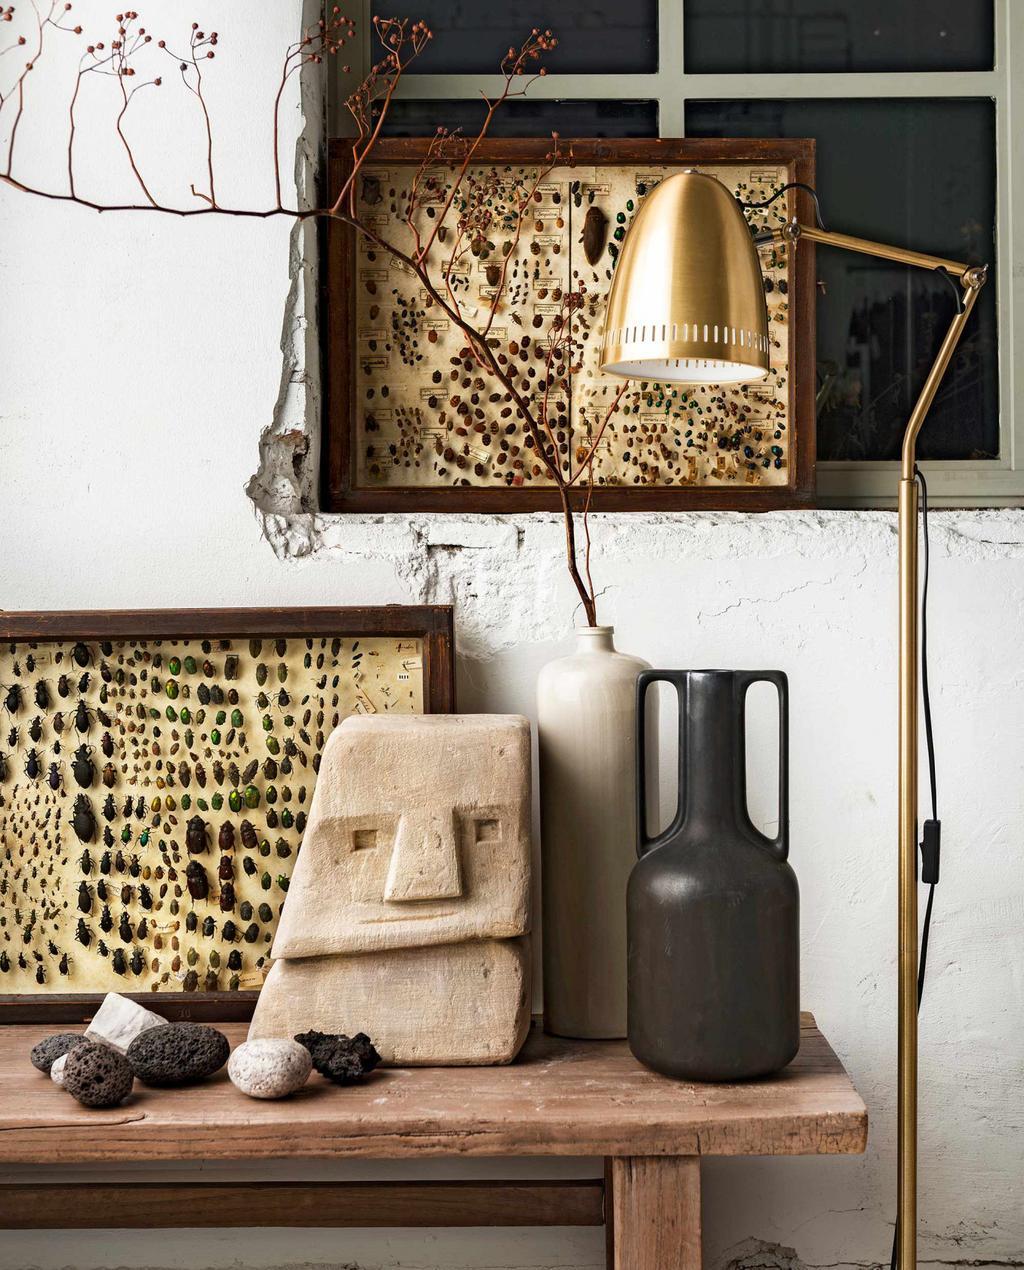 vitrines insectes